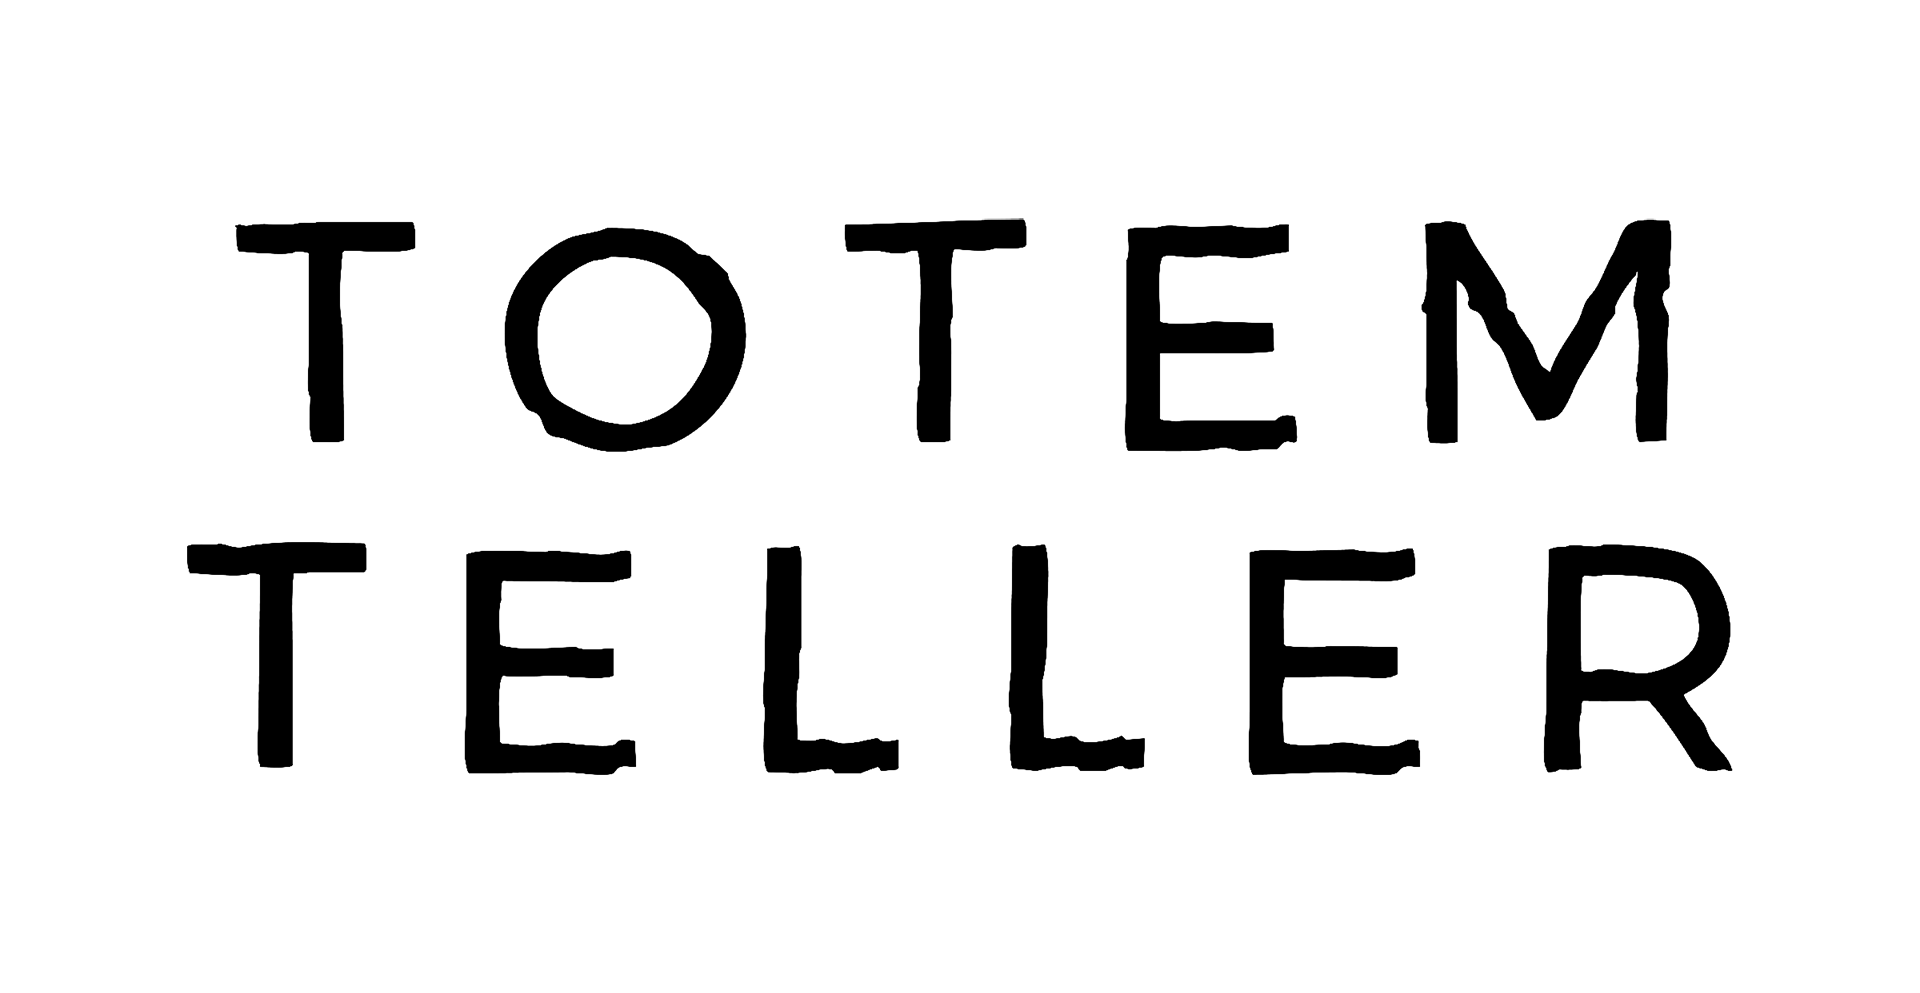 Totem Teller Windows Mac Linux Xone Ps4 Switch Game